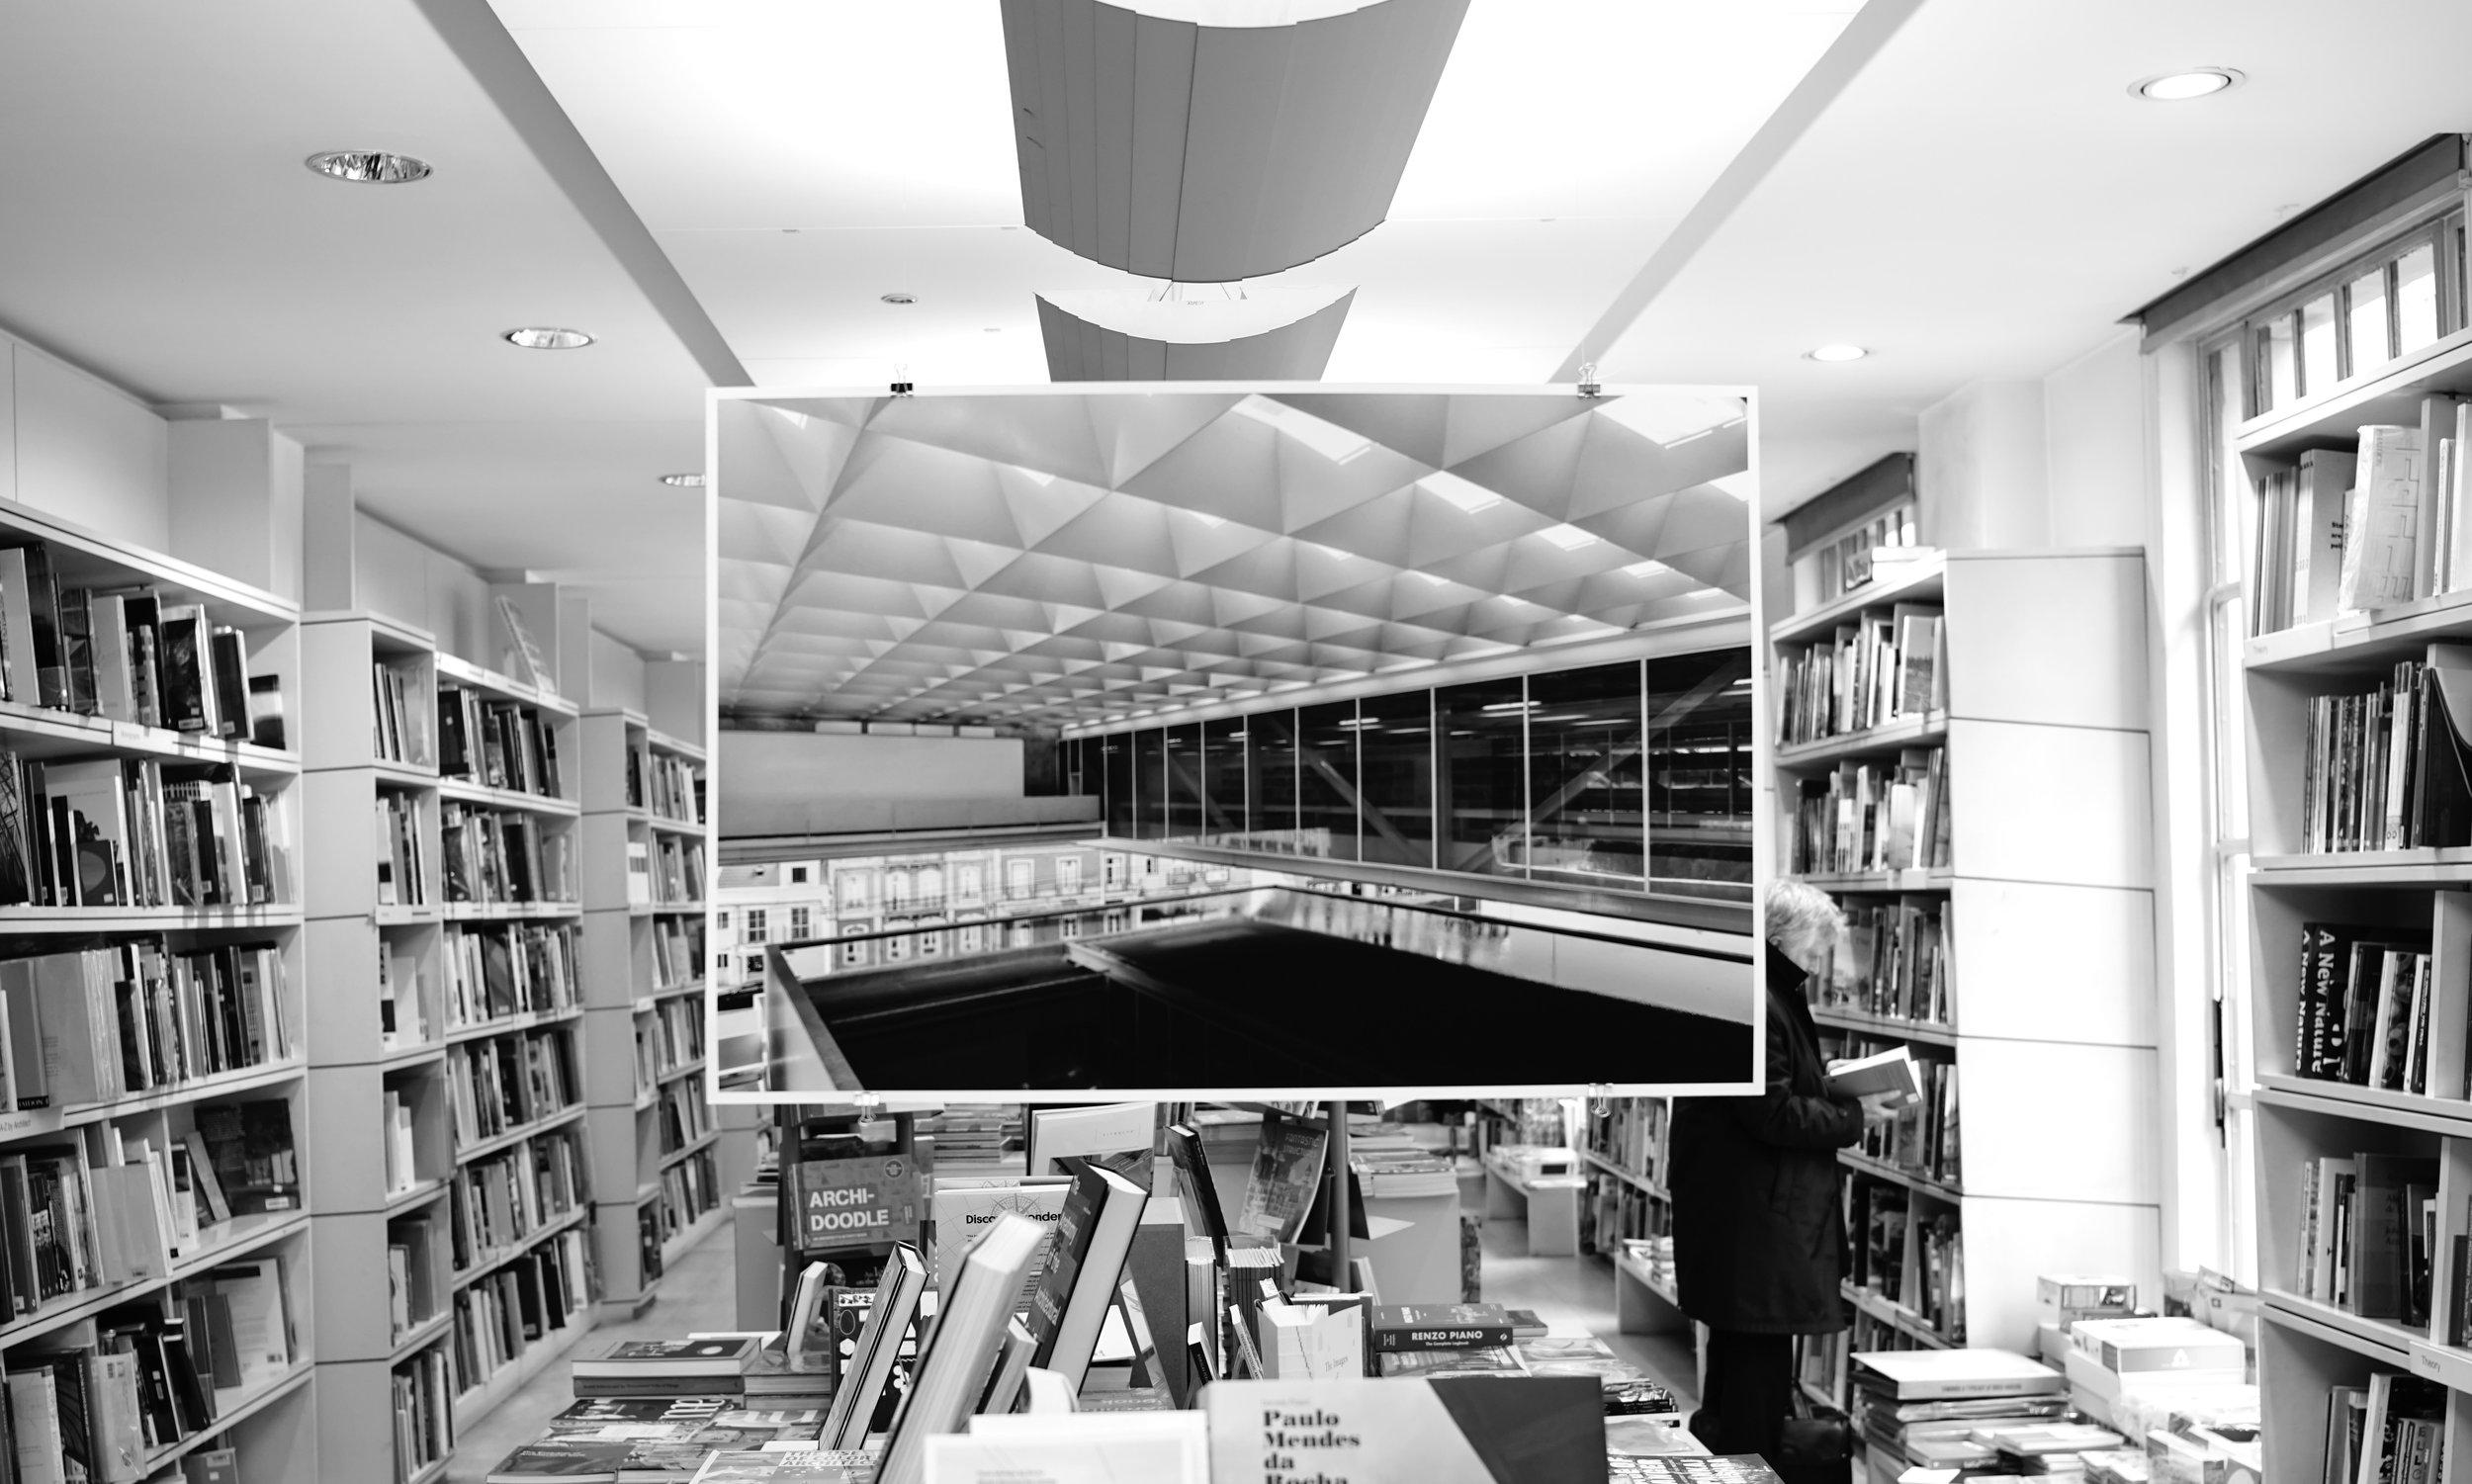 ....Riba Bookshop.London. UK.. Livraria Riba.Londres. Reino Unido....